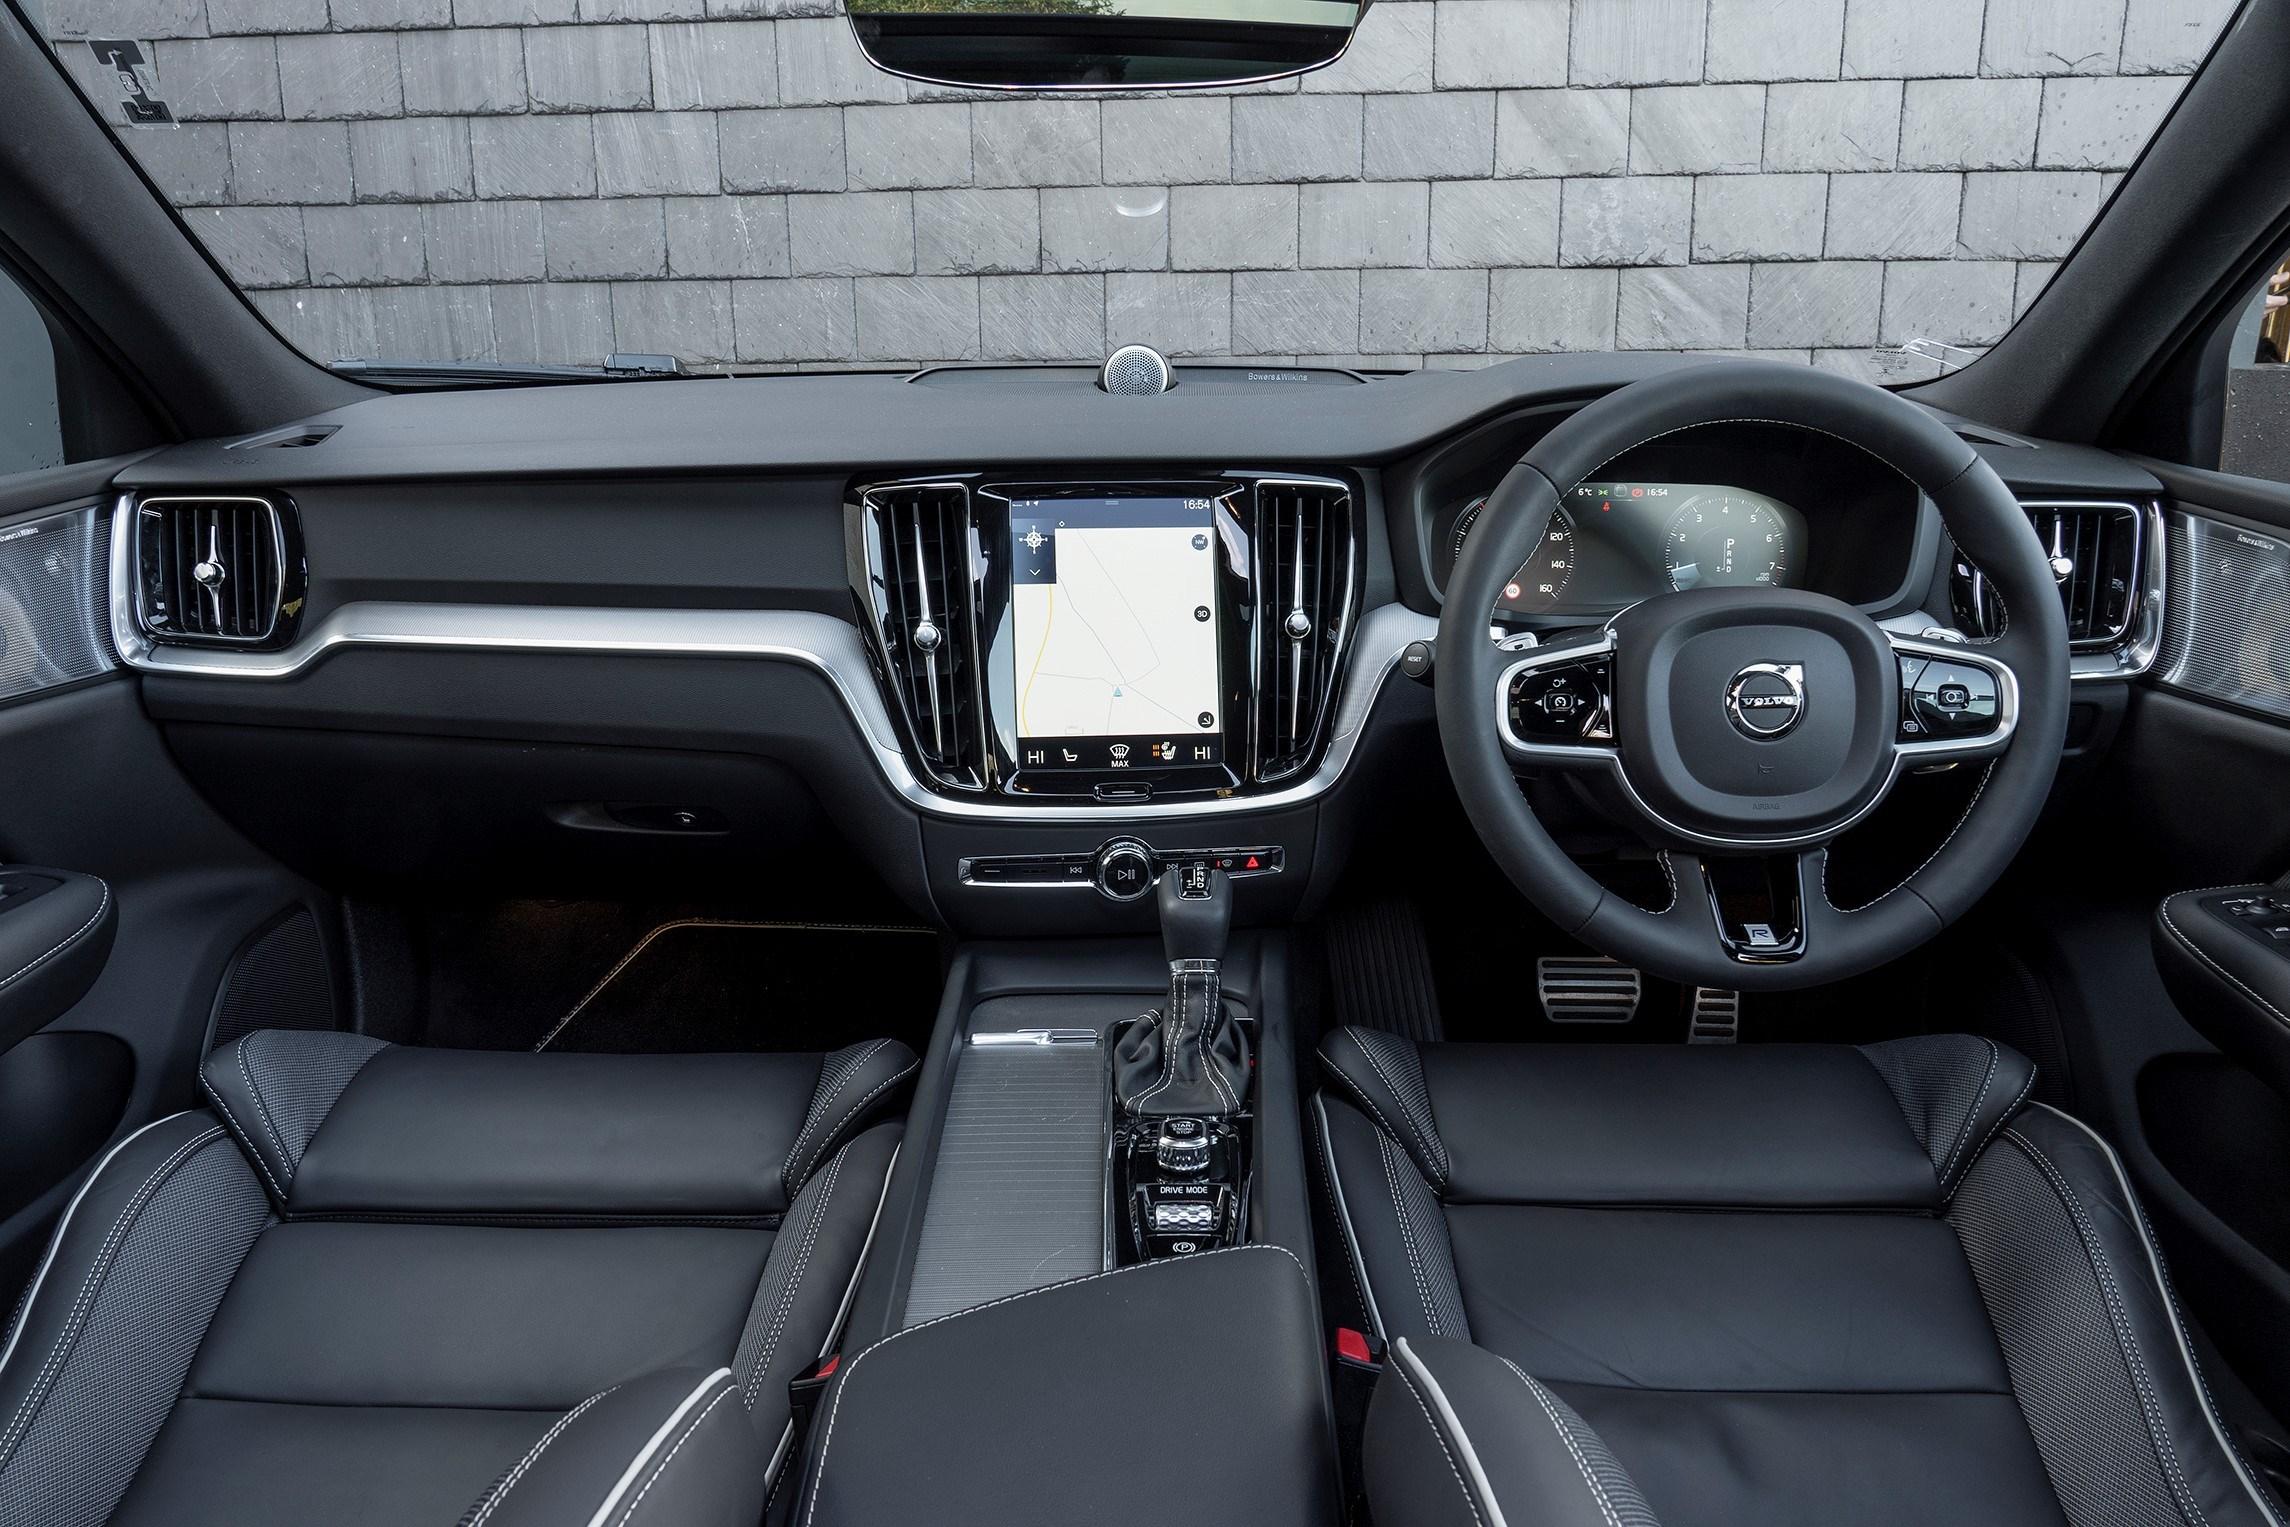 Interior of the Volvo S60 T5